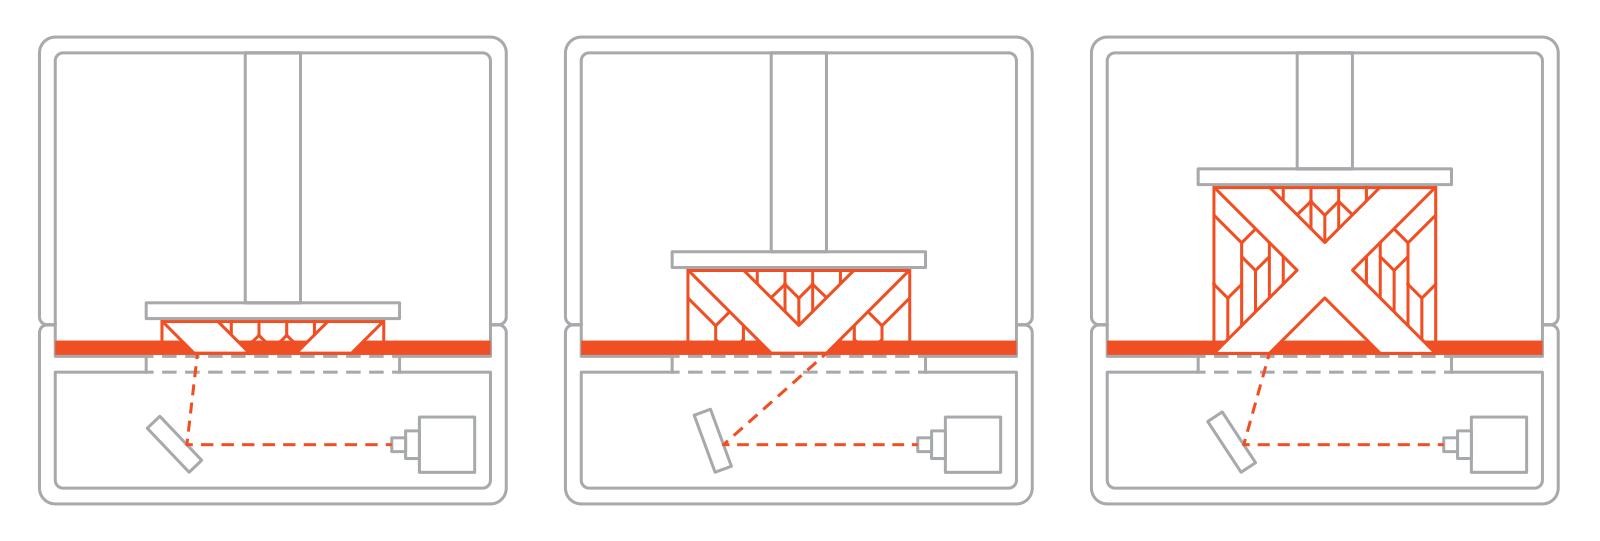 https://s3-eu-west-1.amazonaws.com/3dhubs-knowledgebase/introduction-sla-3d-printing/8-sla-steps.png